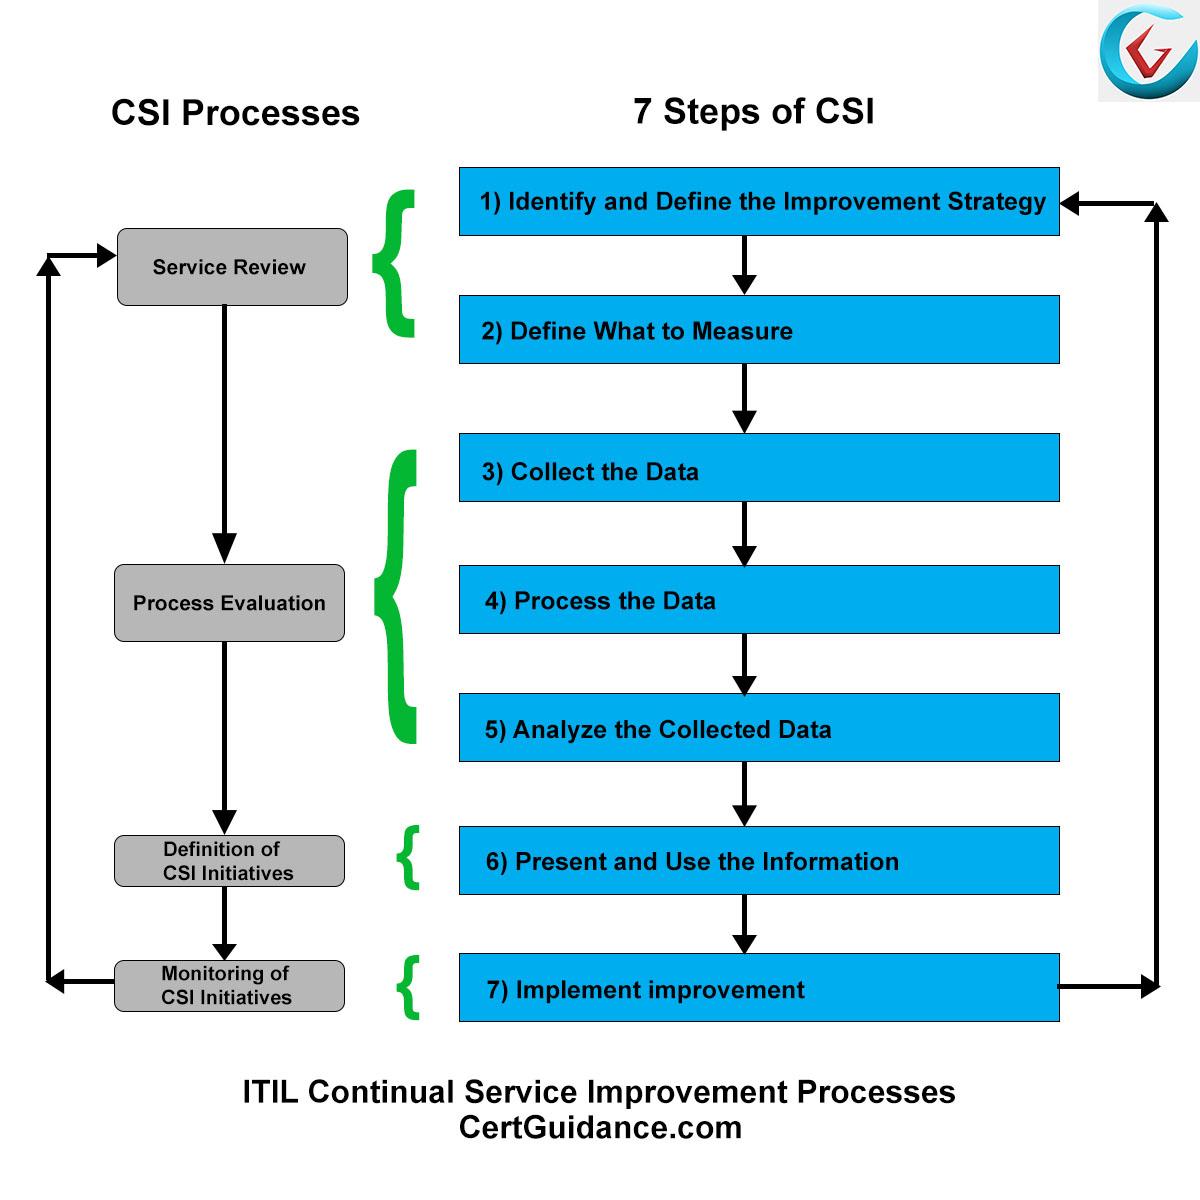 ITIL Continual Service Improvement | ITIL Foundation | ITSM